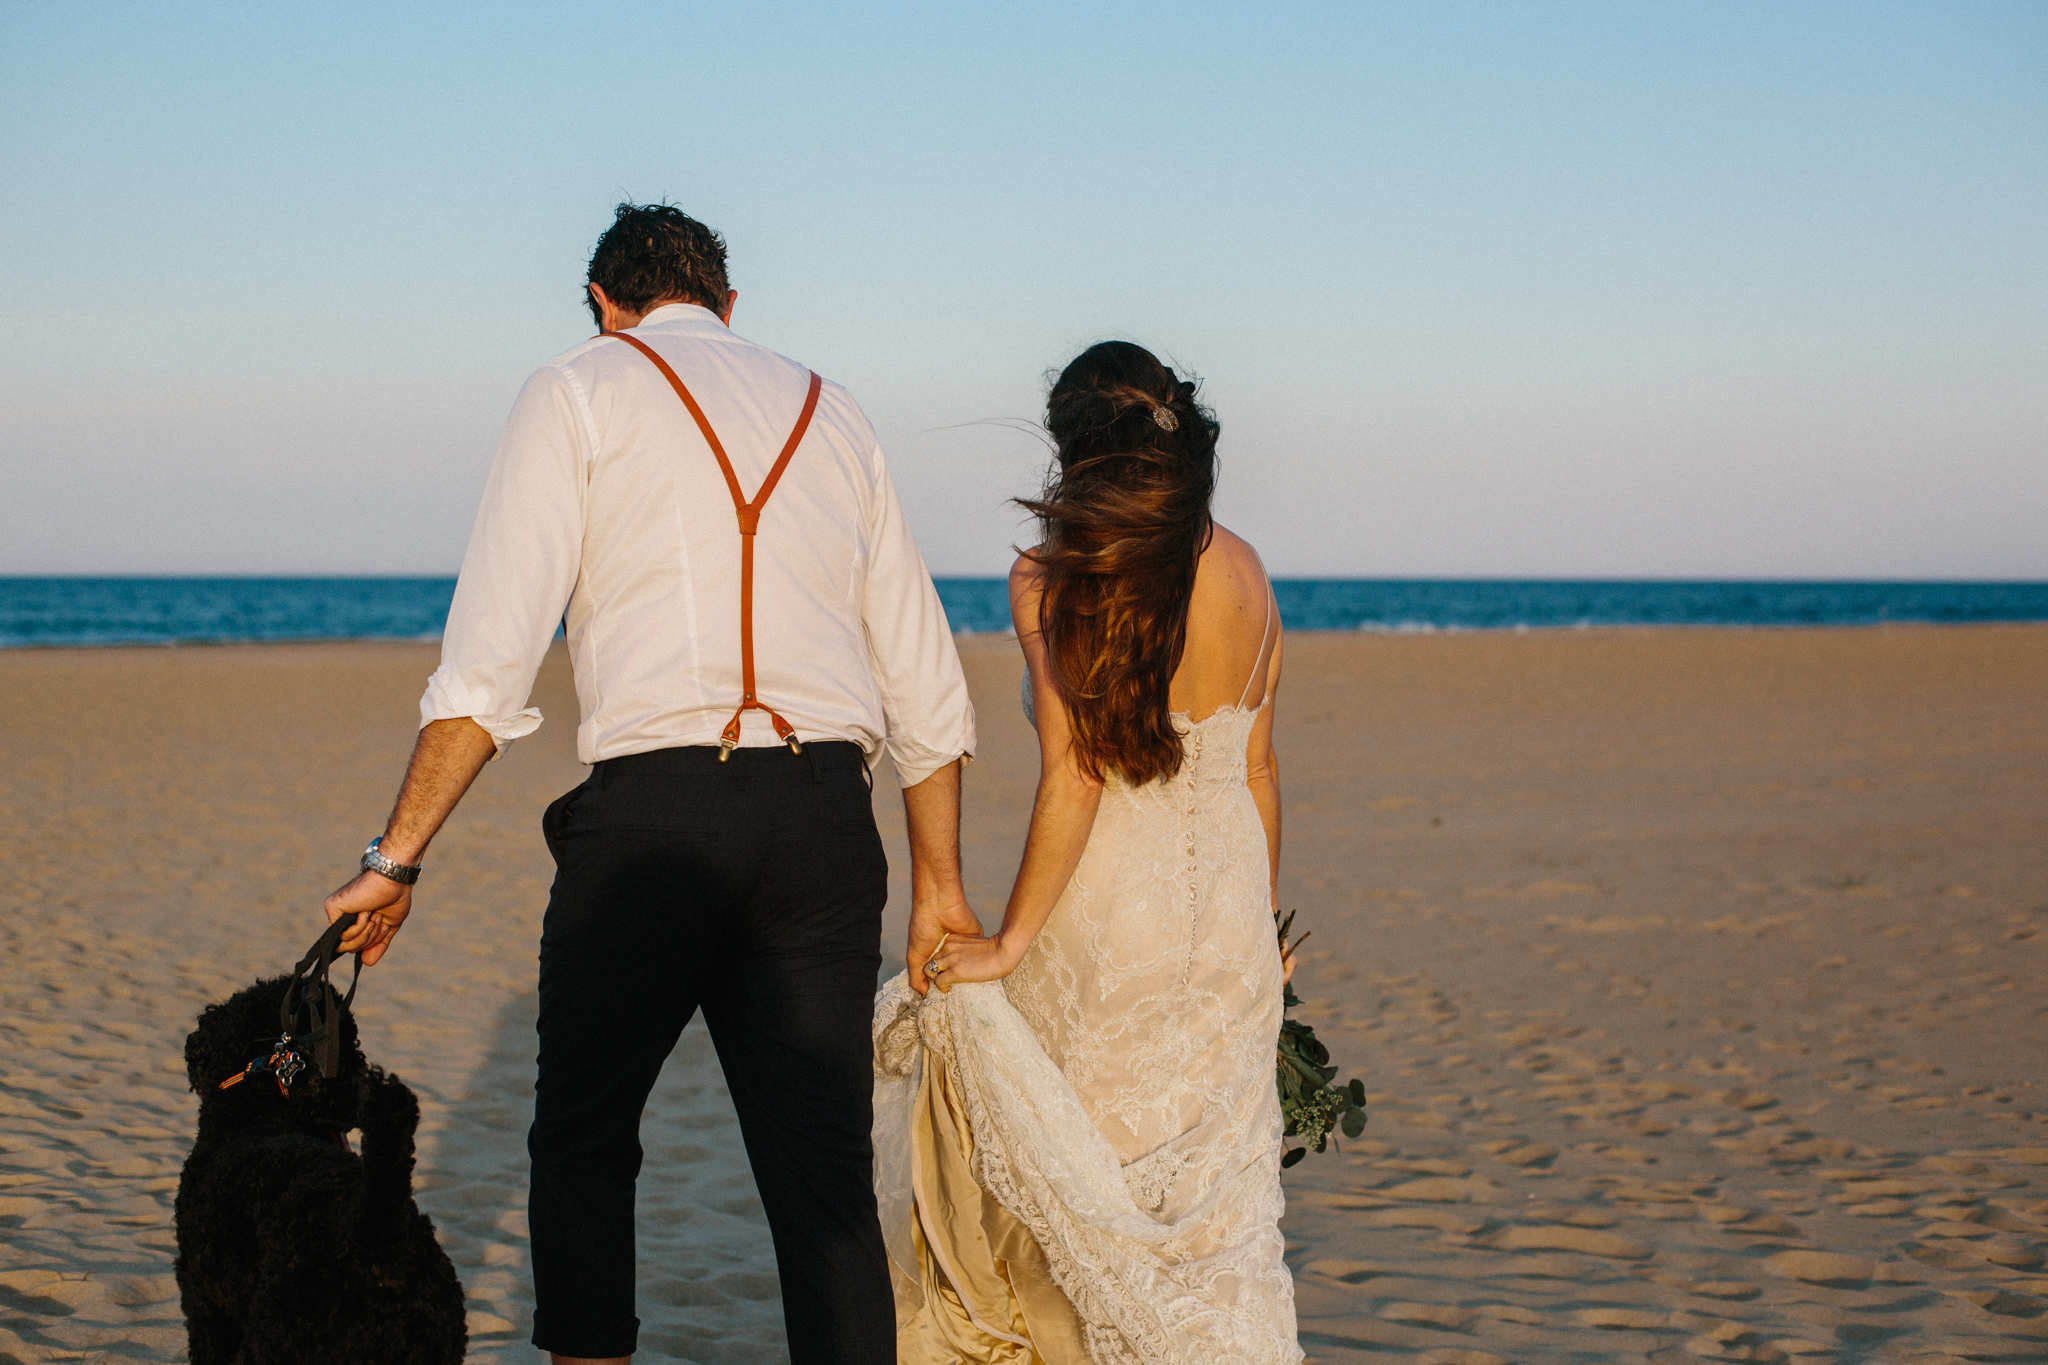 anniversary_virginia_beach_oceanfront_rebeccaburtphotography-19.jpg